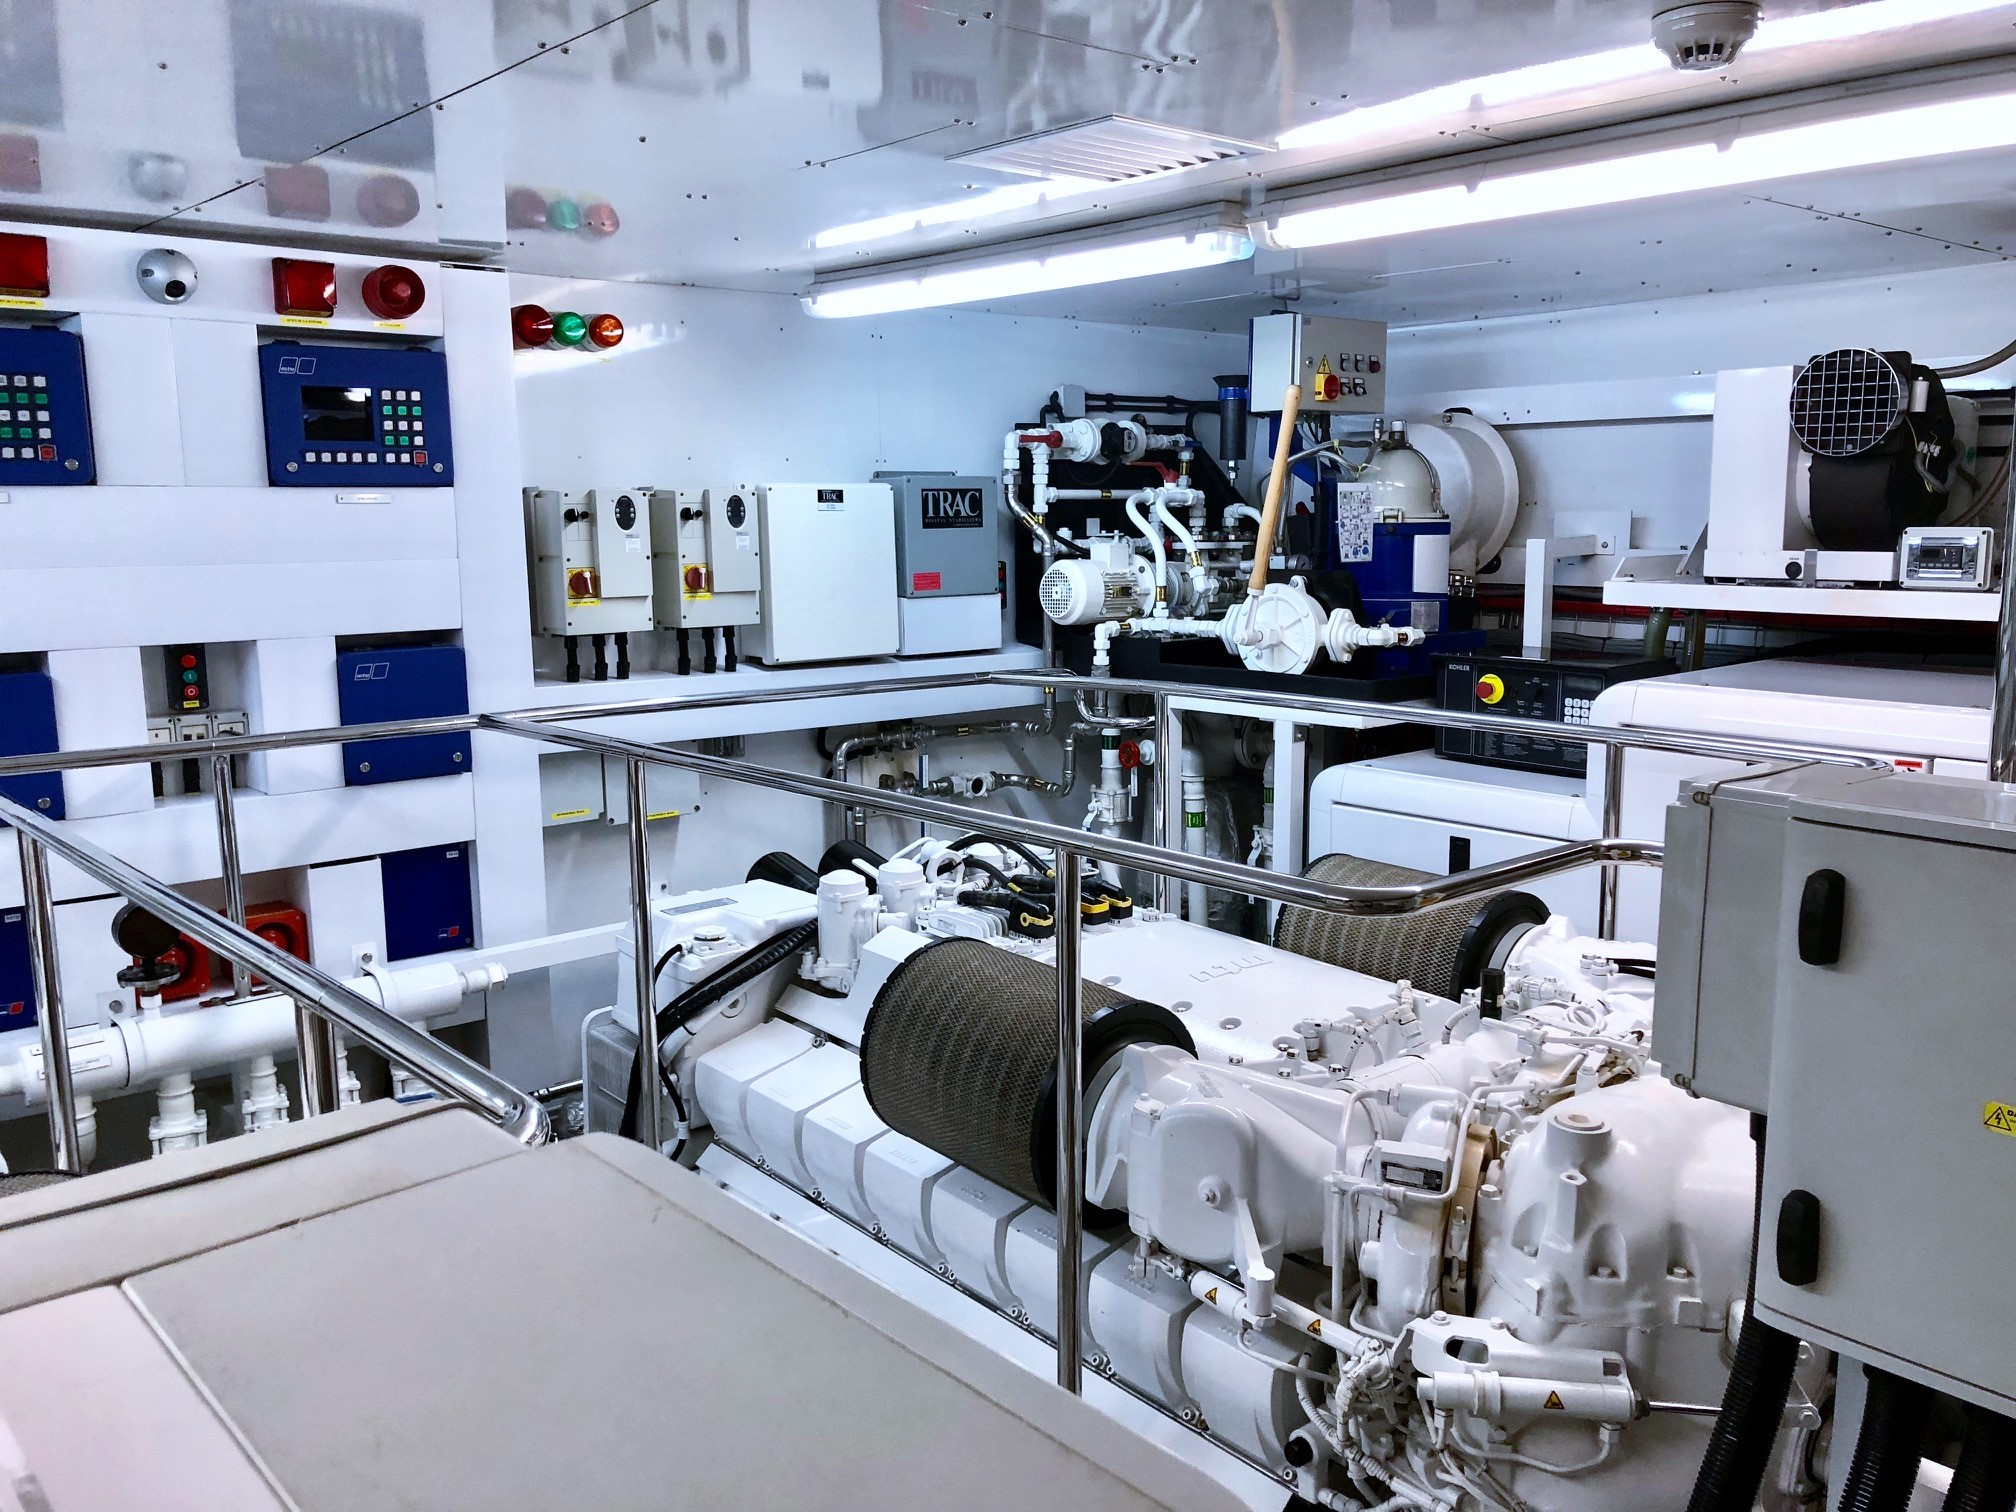 Manhattan Express II - Engine Room